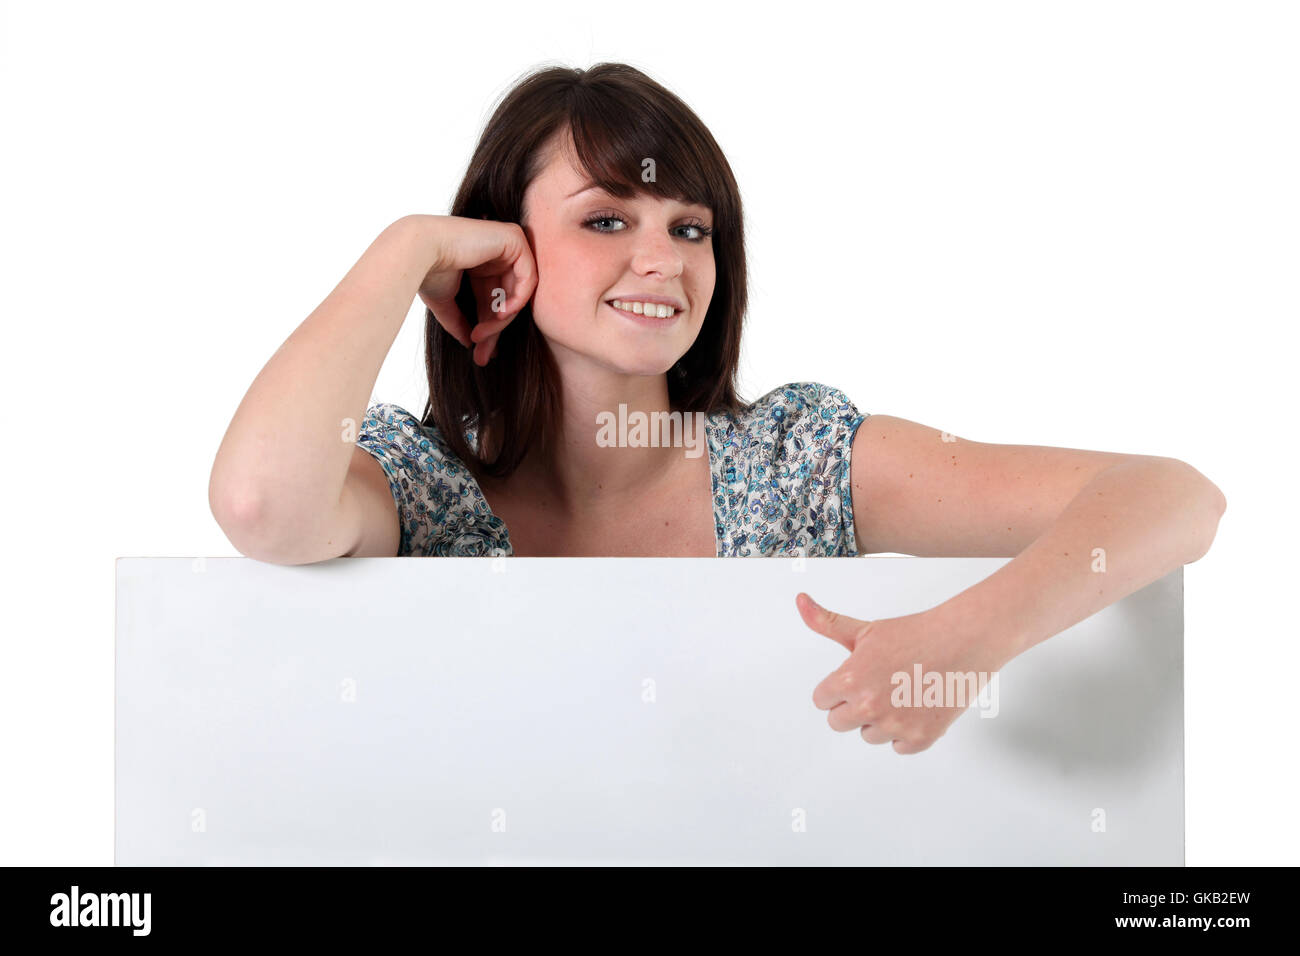 board sweet teen - Stock Image